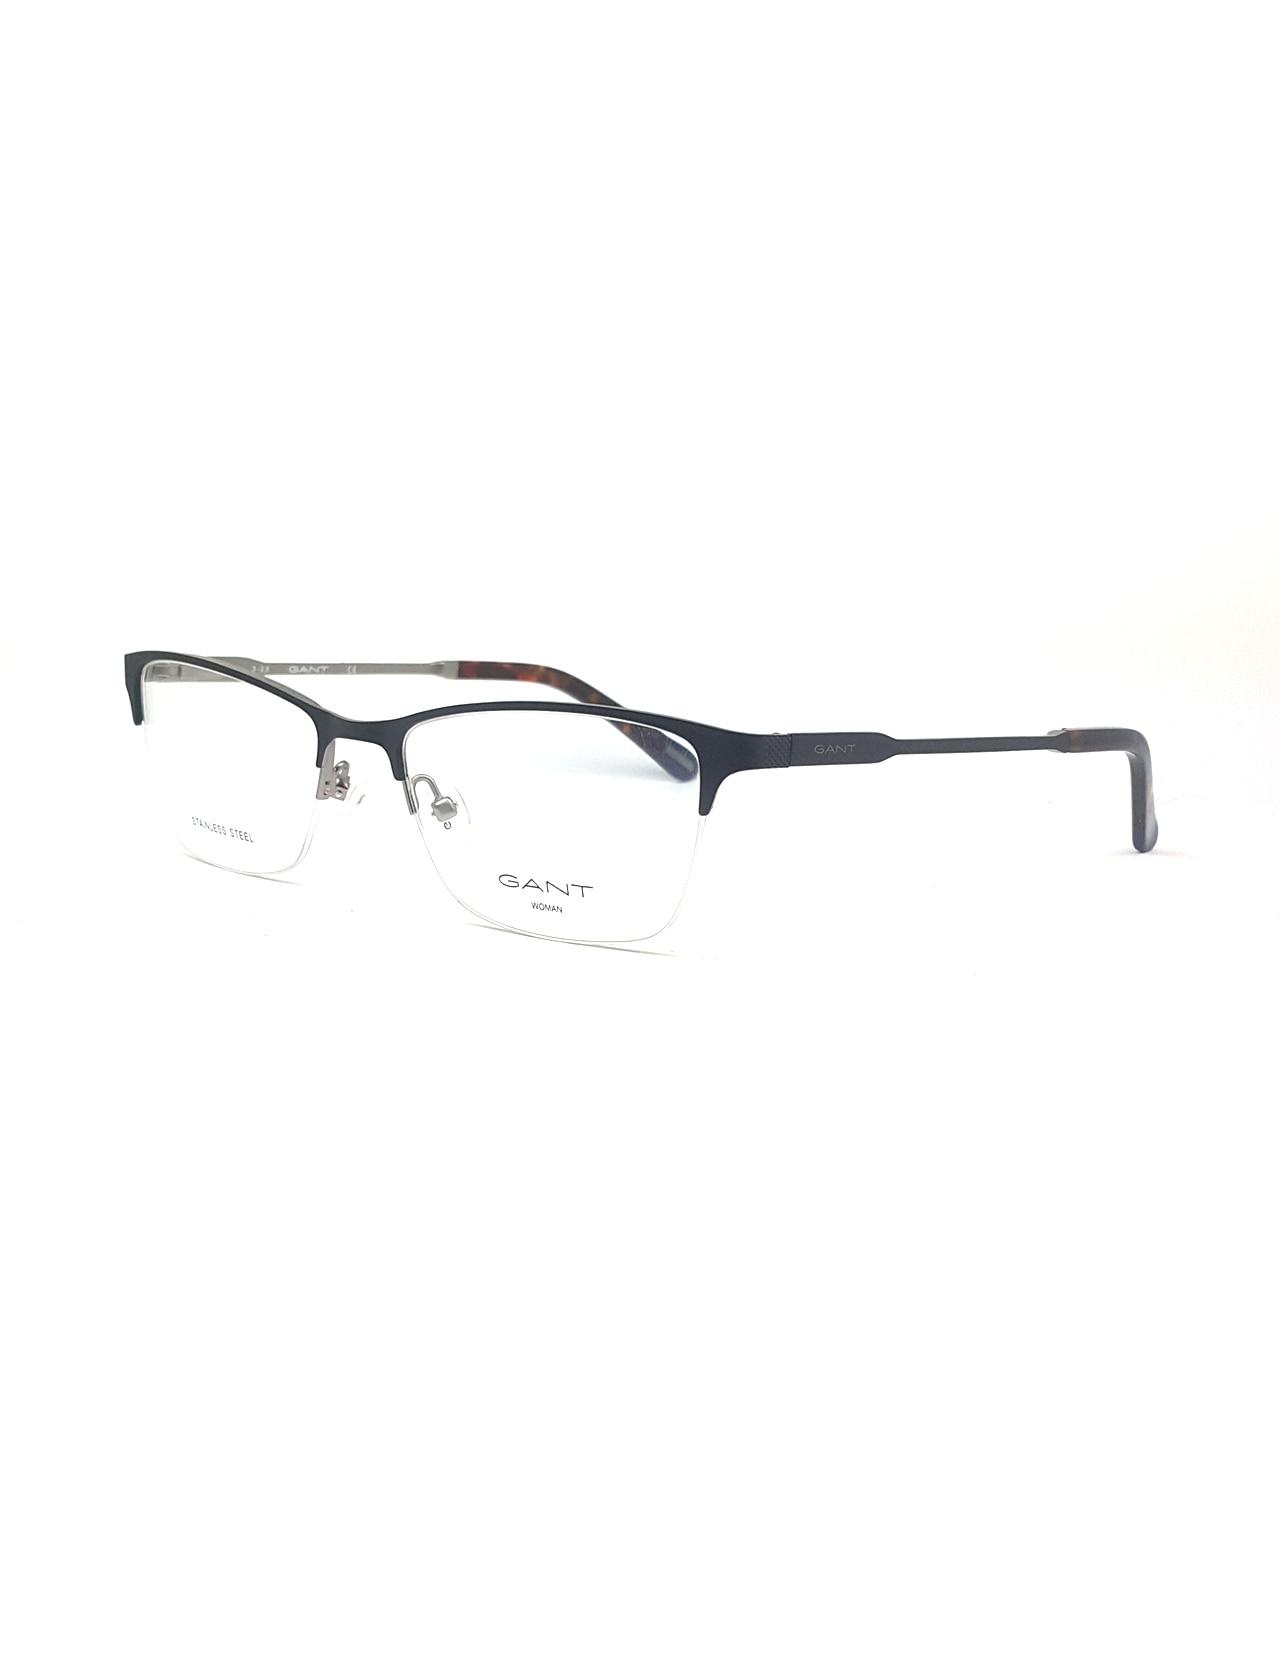 Markamilla Women Reading Glasses Frame Demo Glasses Eyewear Transparent High Quality WomenGant GNT 4067 002